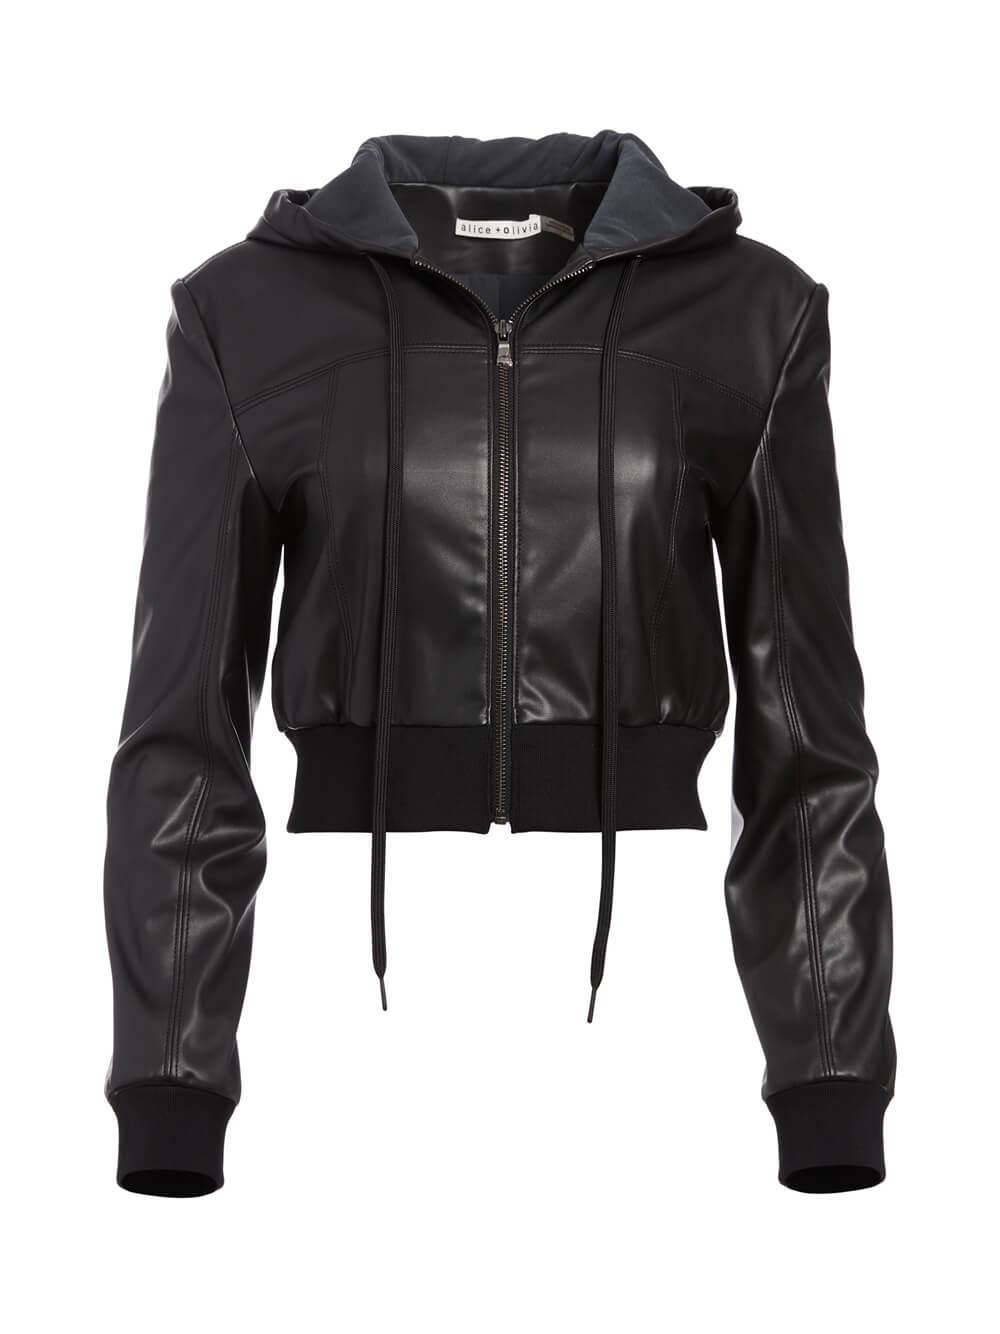 Paulie Vegan Leather Jacket With Hood Item # CC011J22206